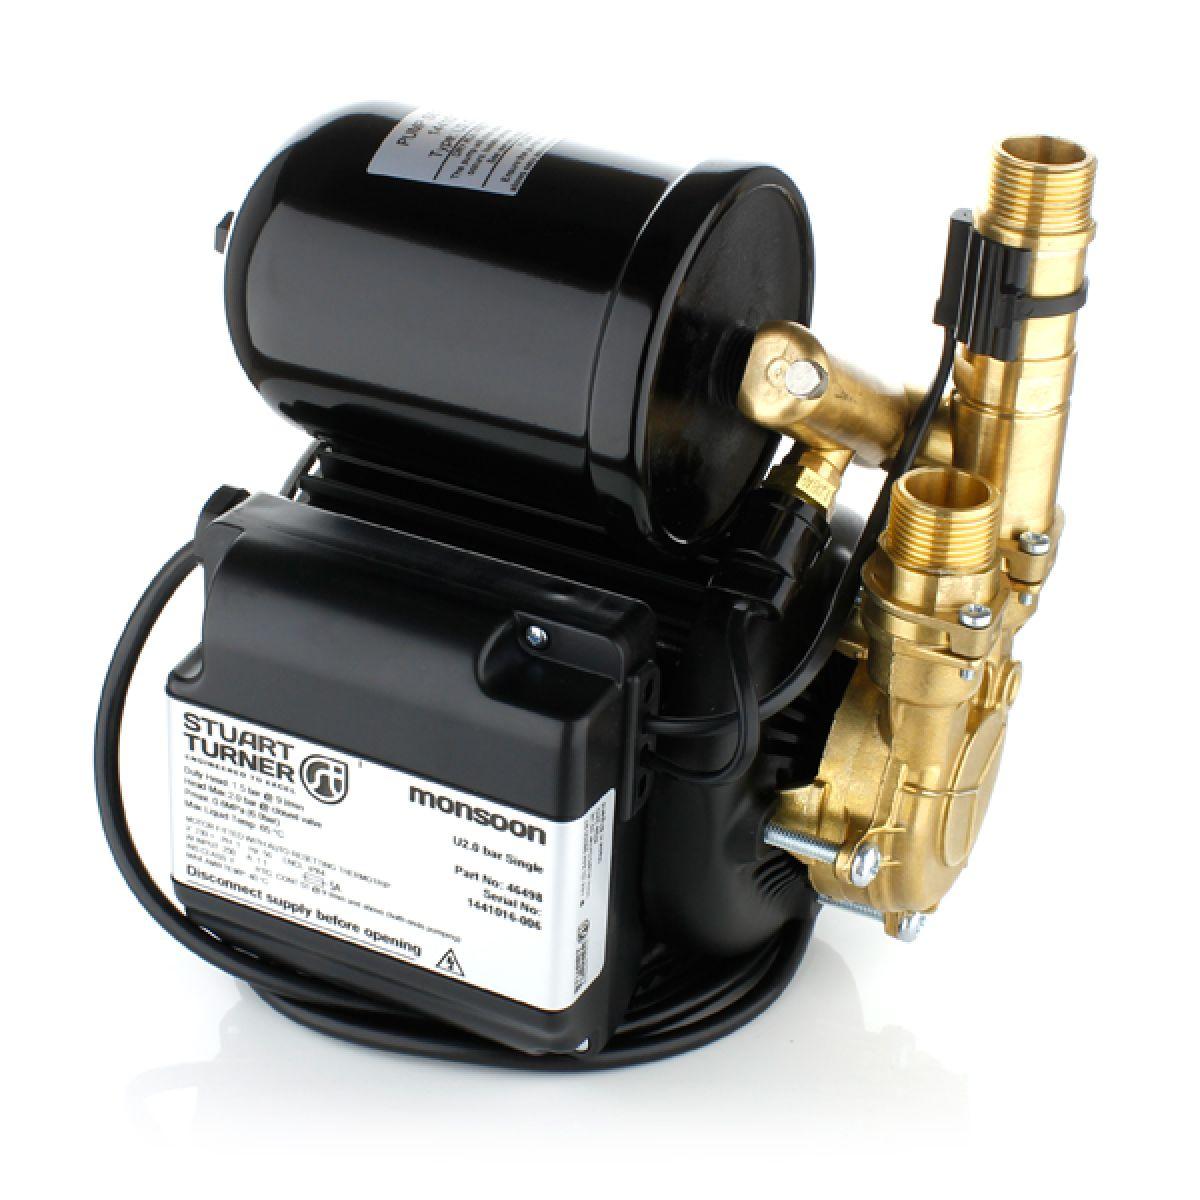 stuart-turner-46498-monsoon-universal-negative-head-pump.jpg